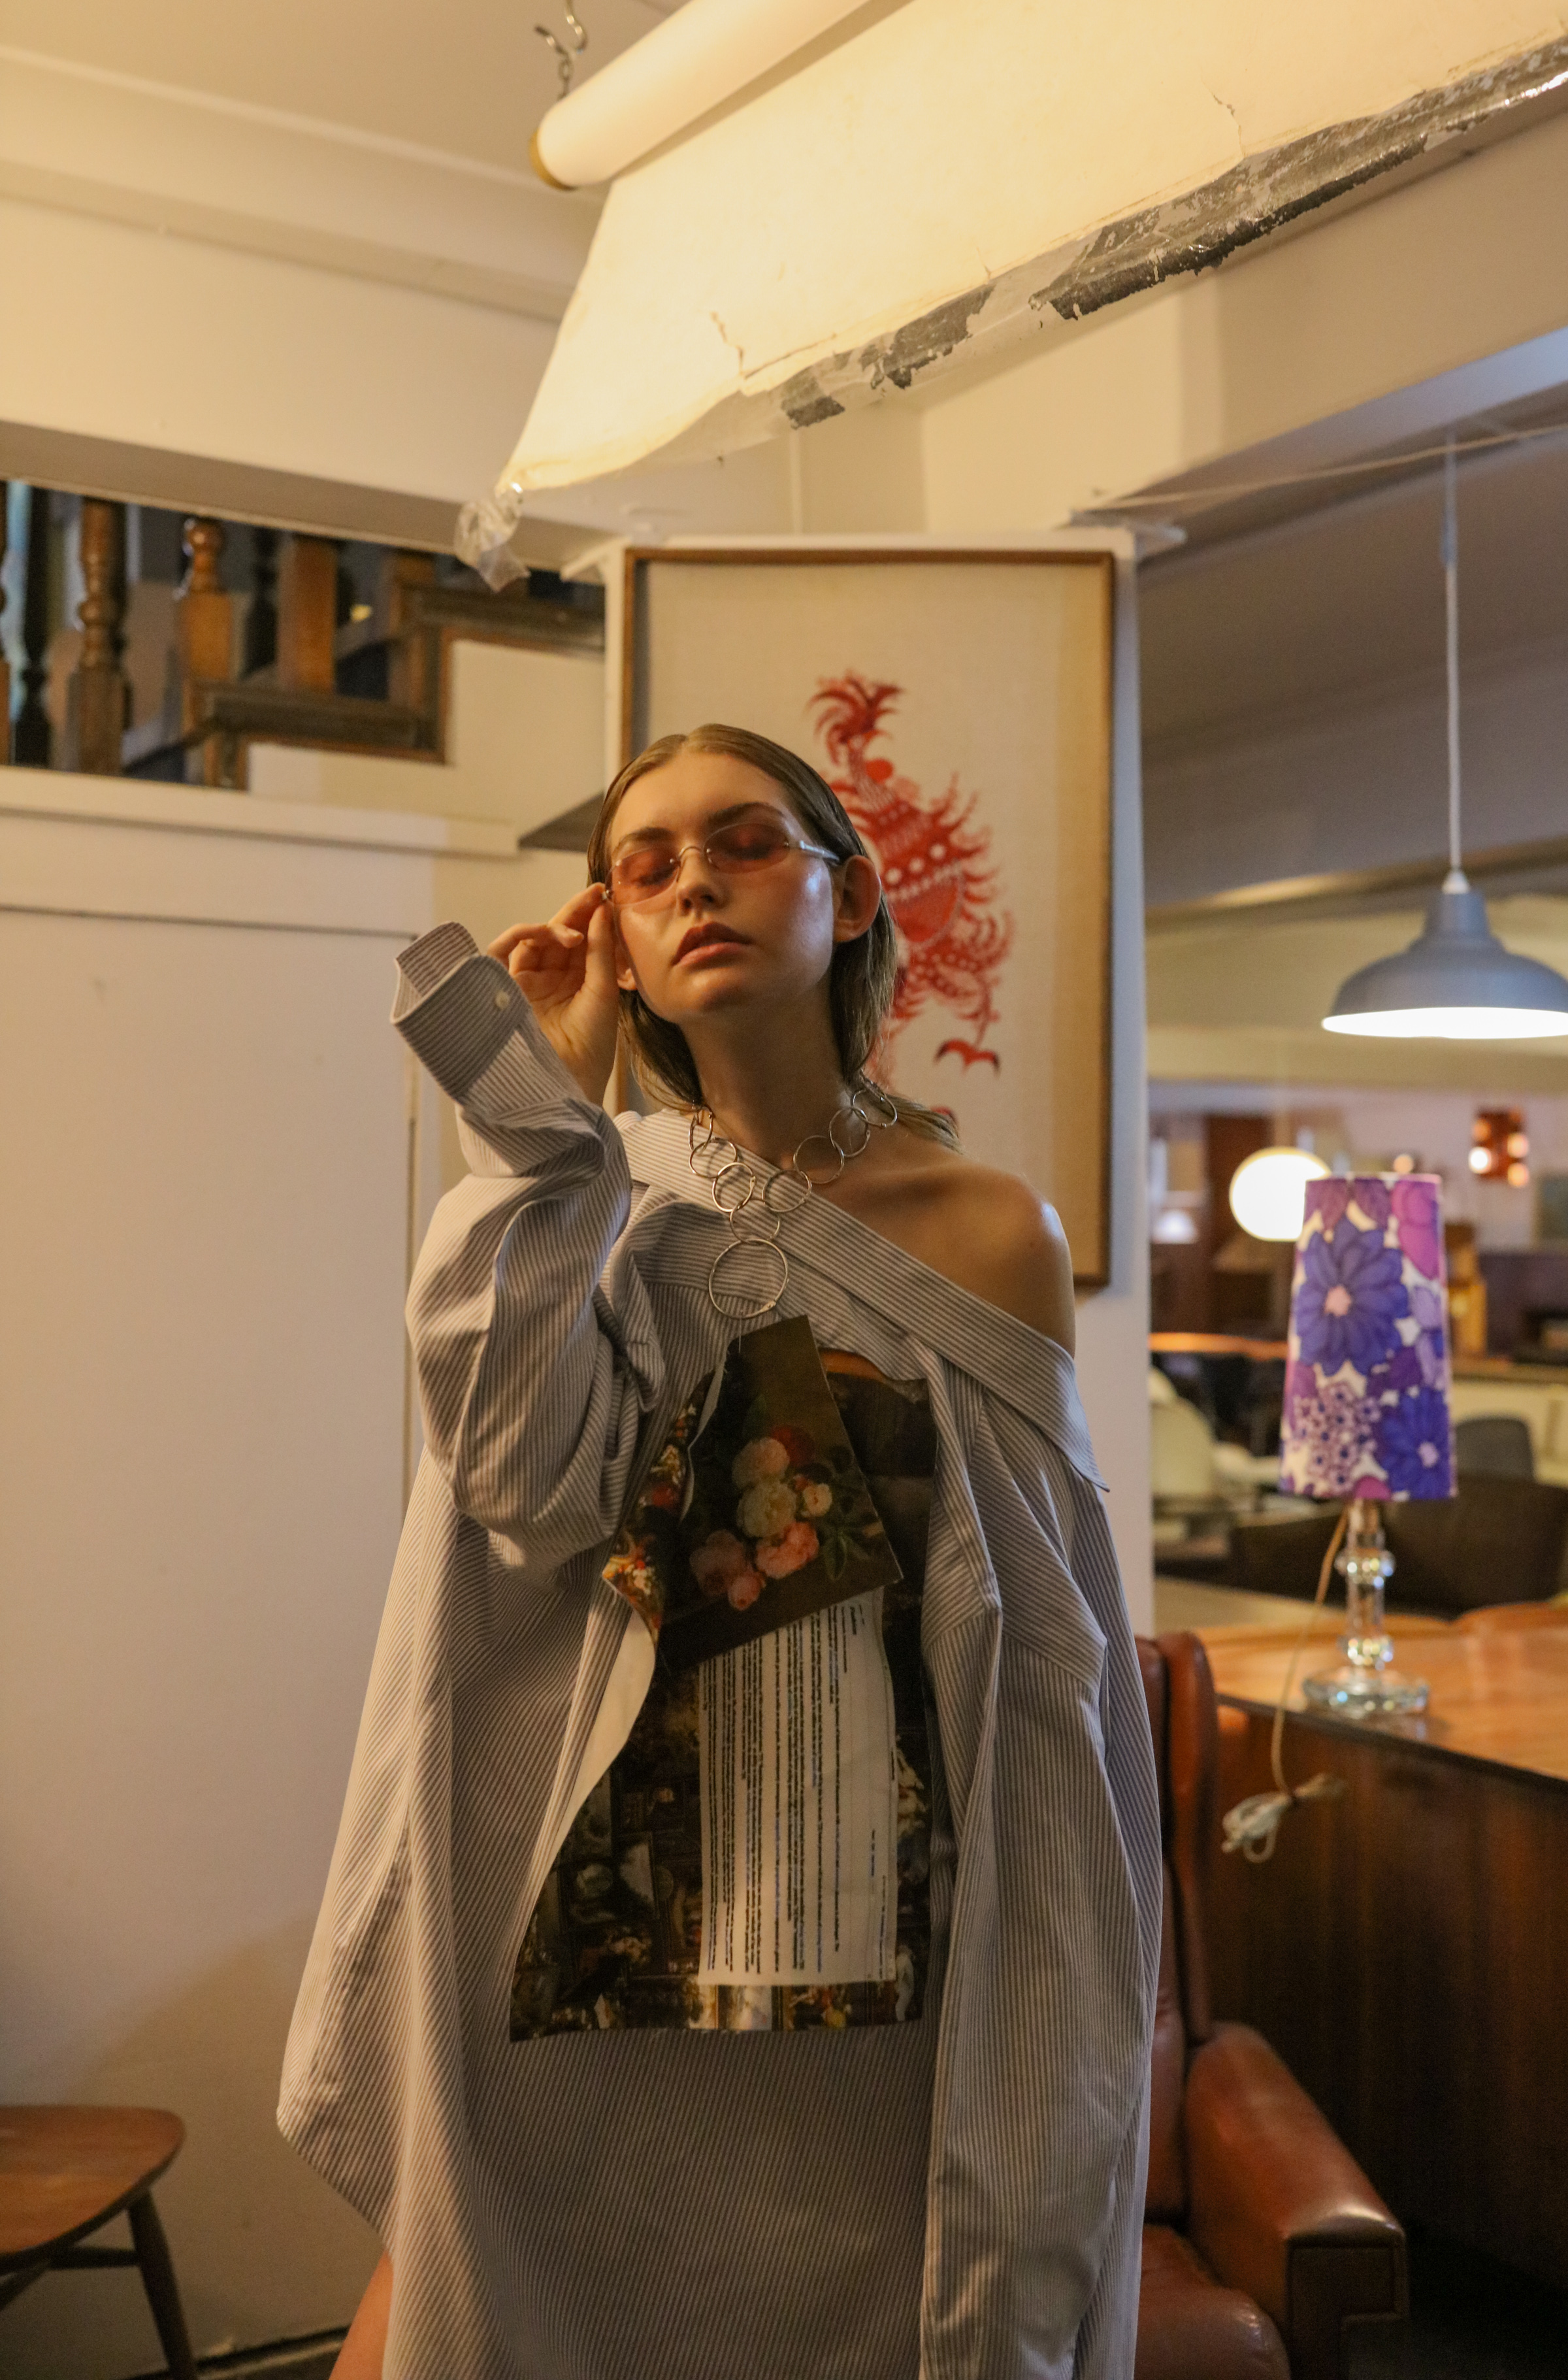 Kymberley wears Samantha Diorio & Jake Paraskeva necklace/earring tags, Samantha Diorio shirt